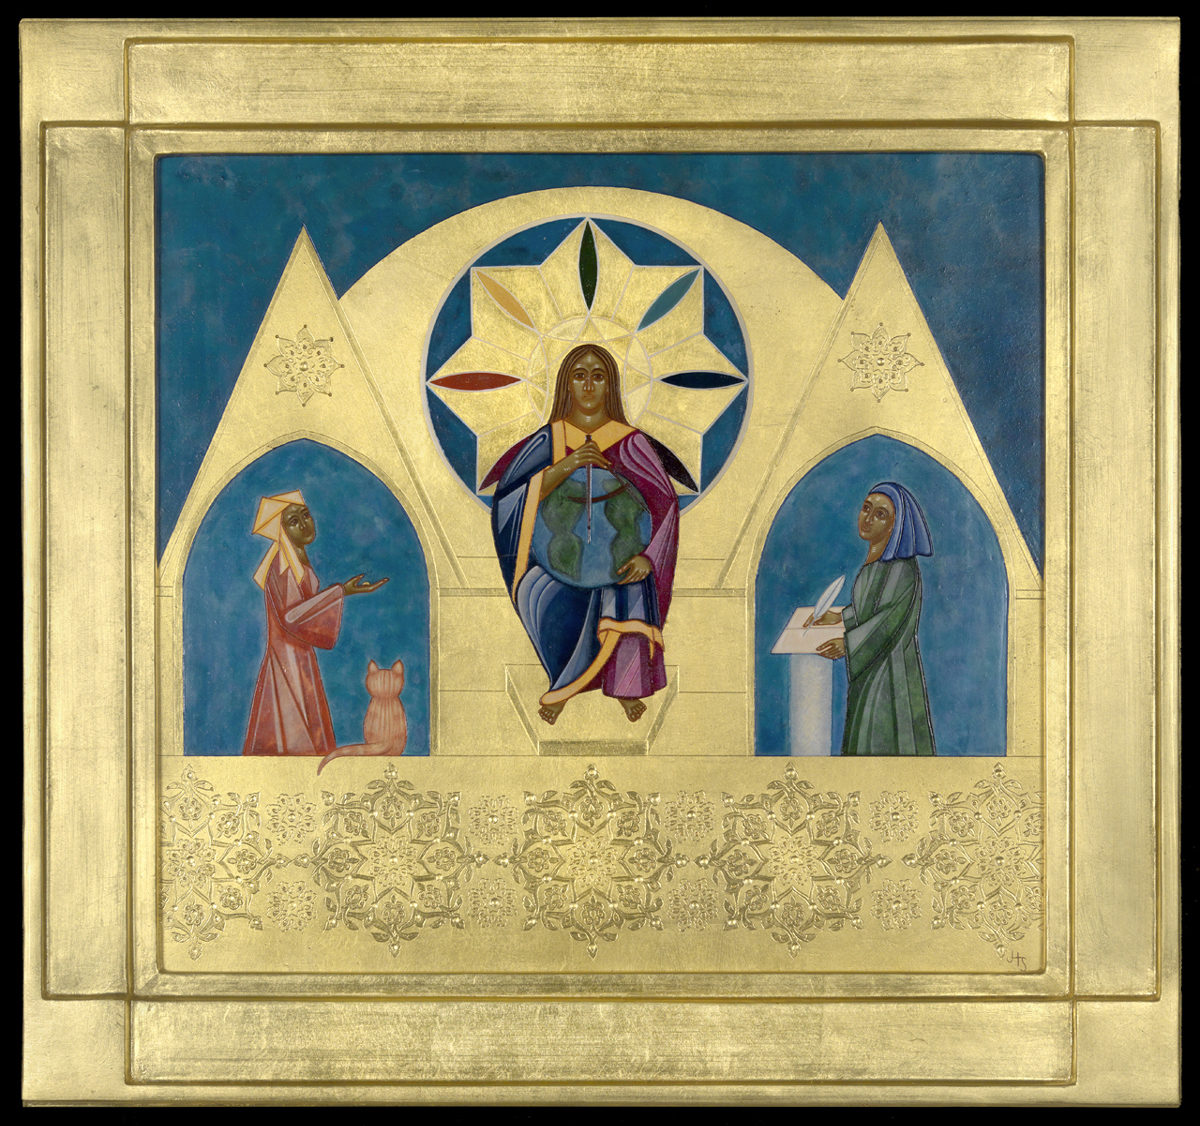 Julian of Norwich and Teresa of Avila, Theodidacts